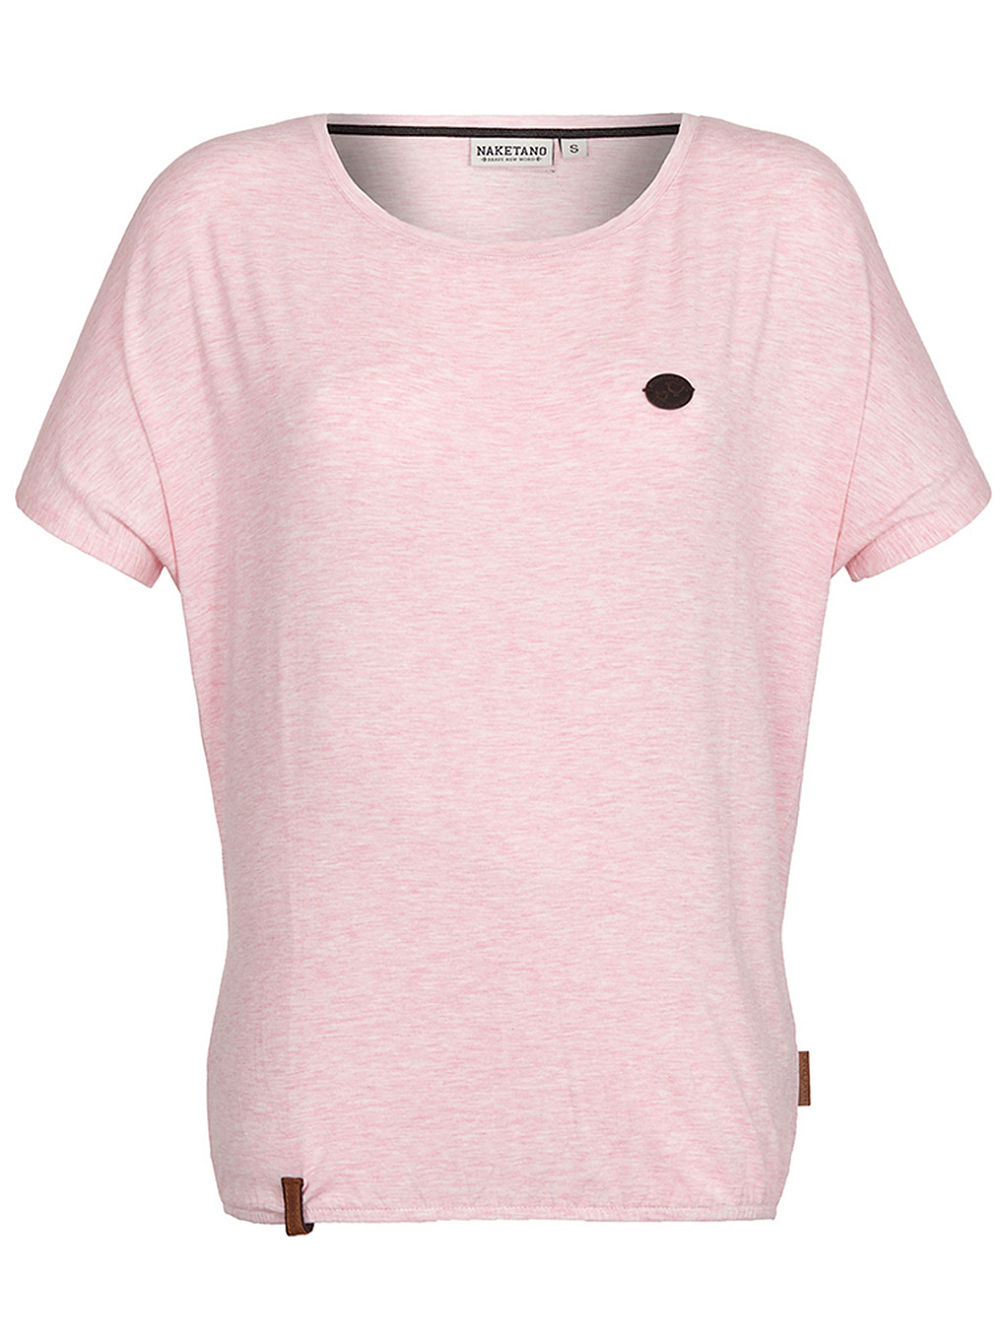 naketano-die-gedudelte-iii-t-shirt